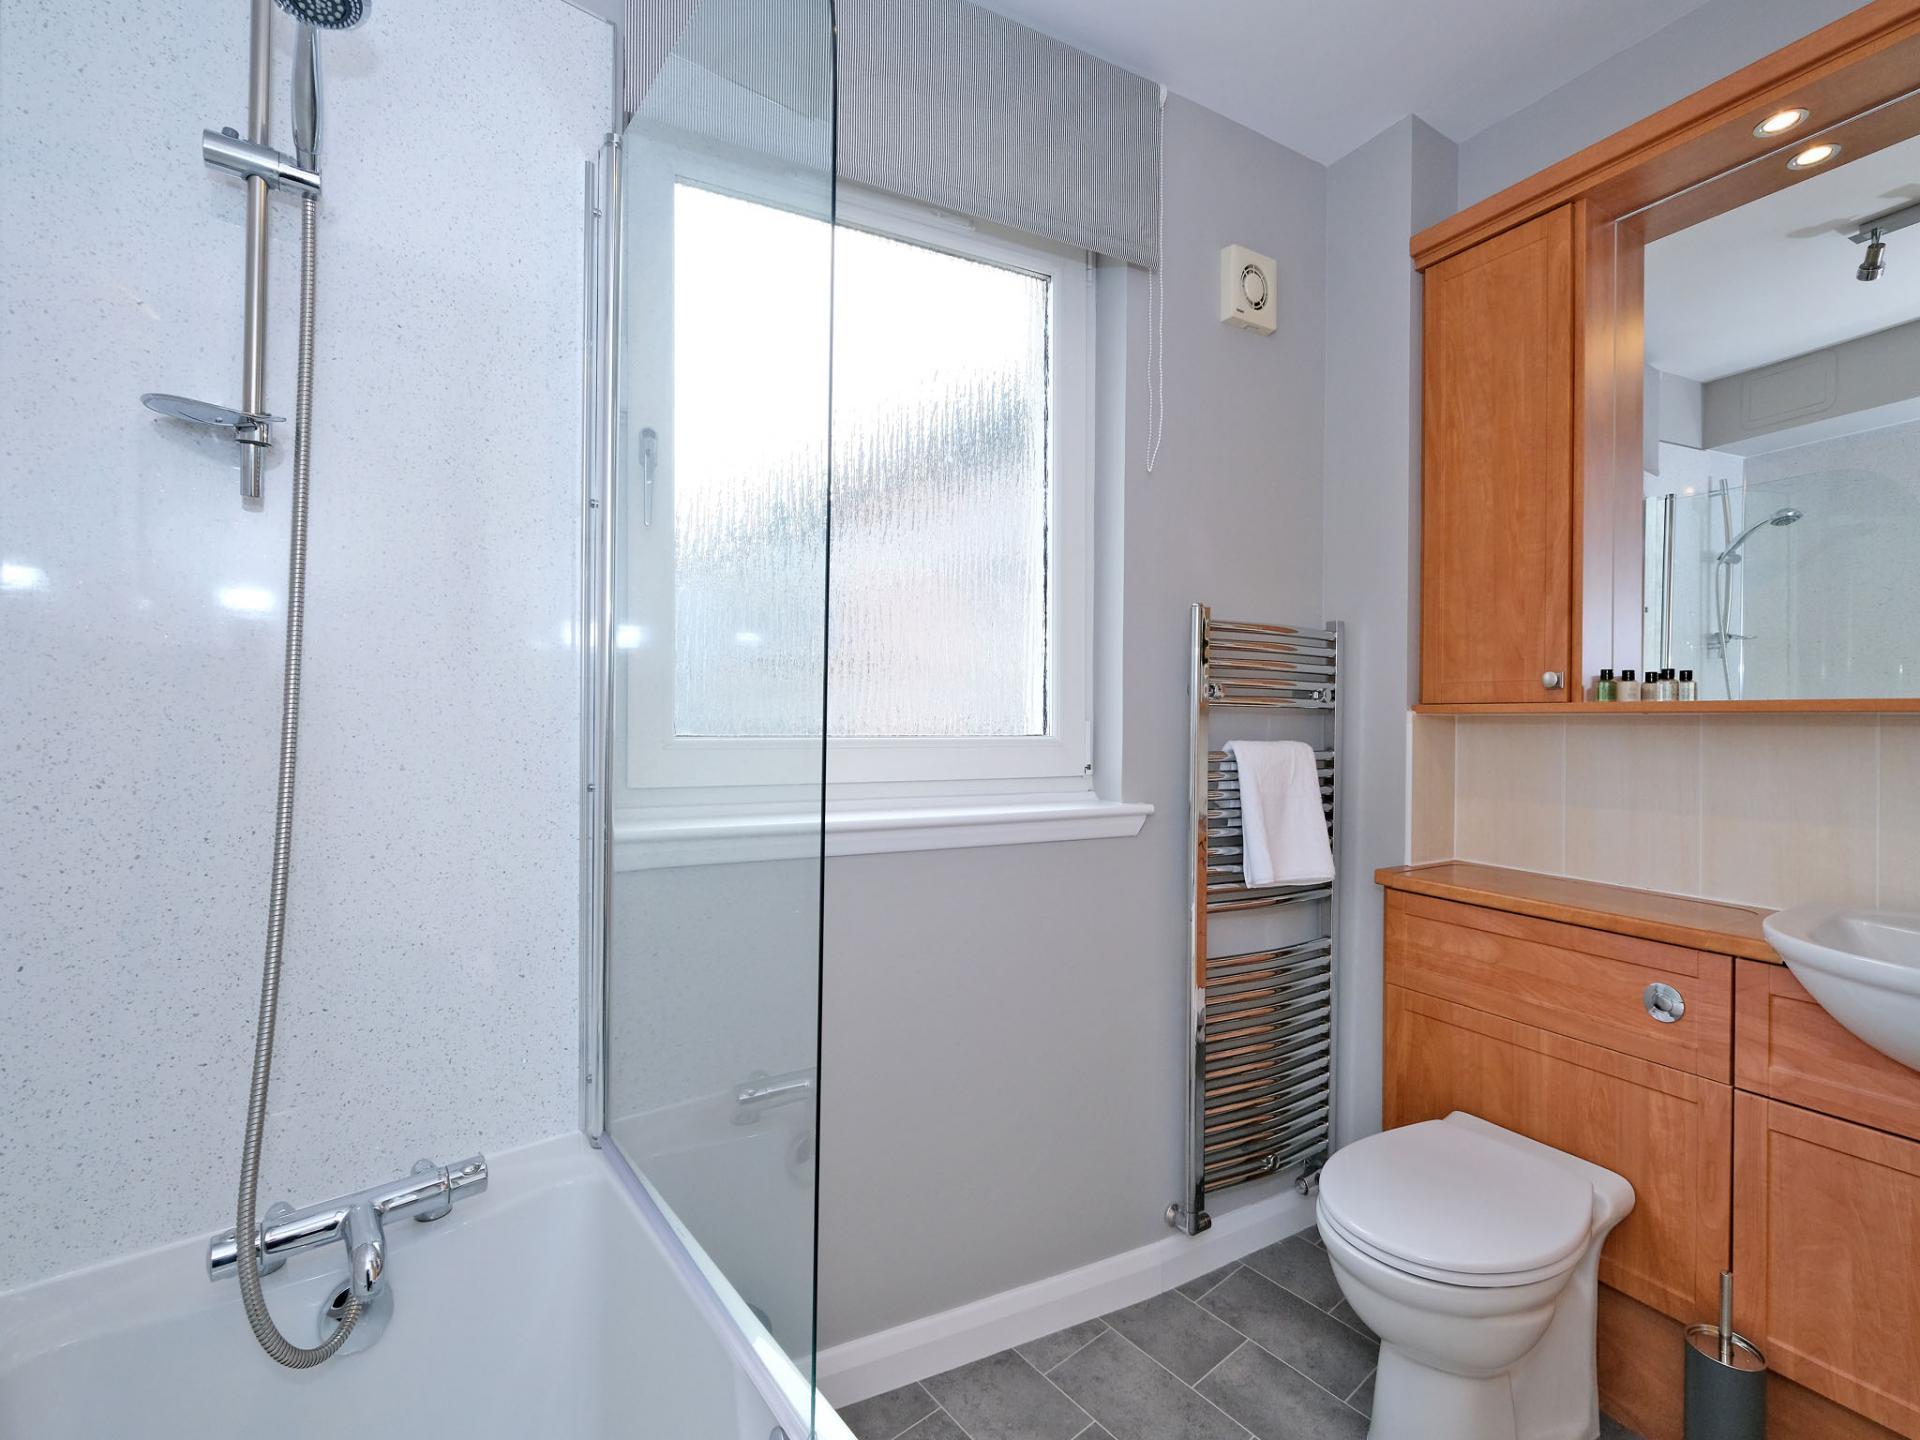 Bathroom at Kepplestone Apartments, Mannofield, Aberdeen - Citybase Apartments